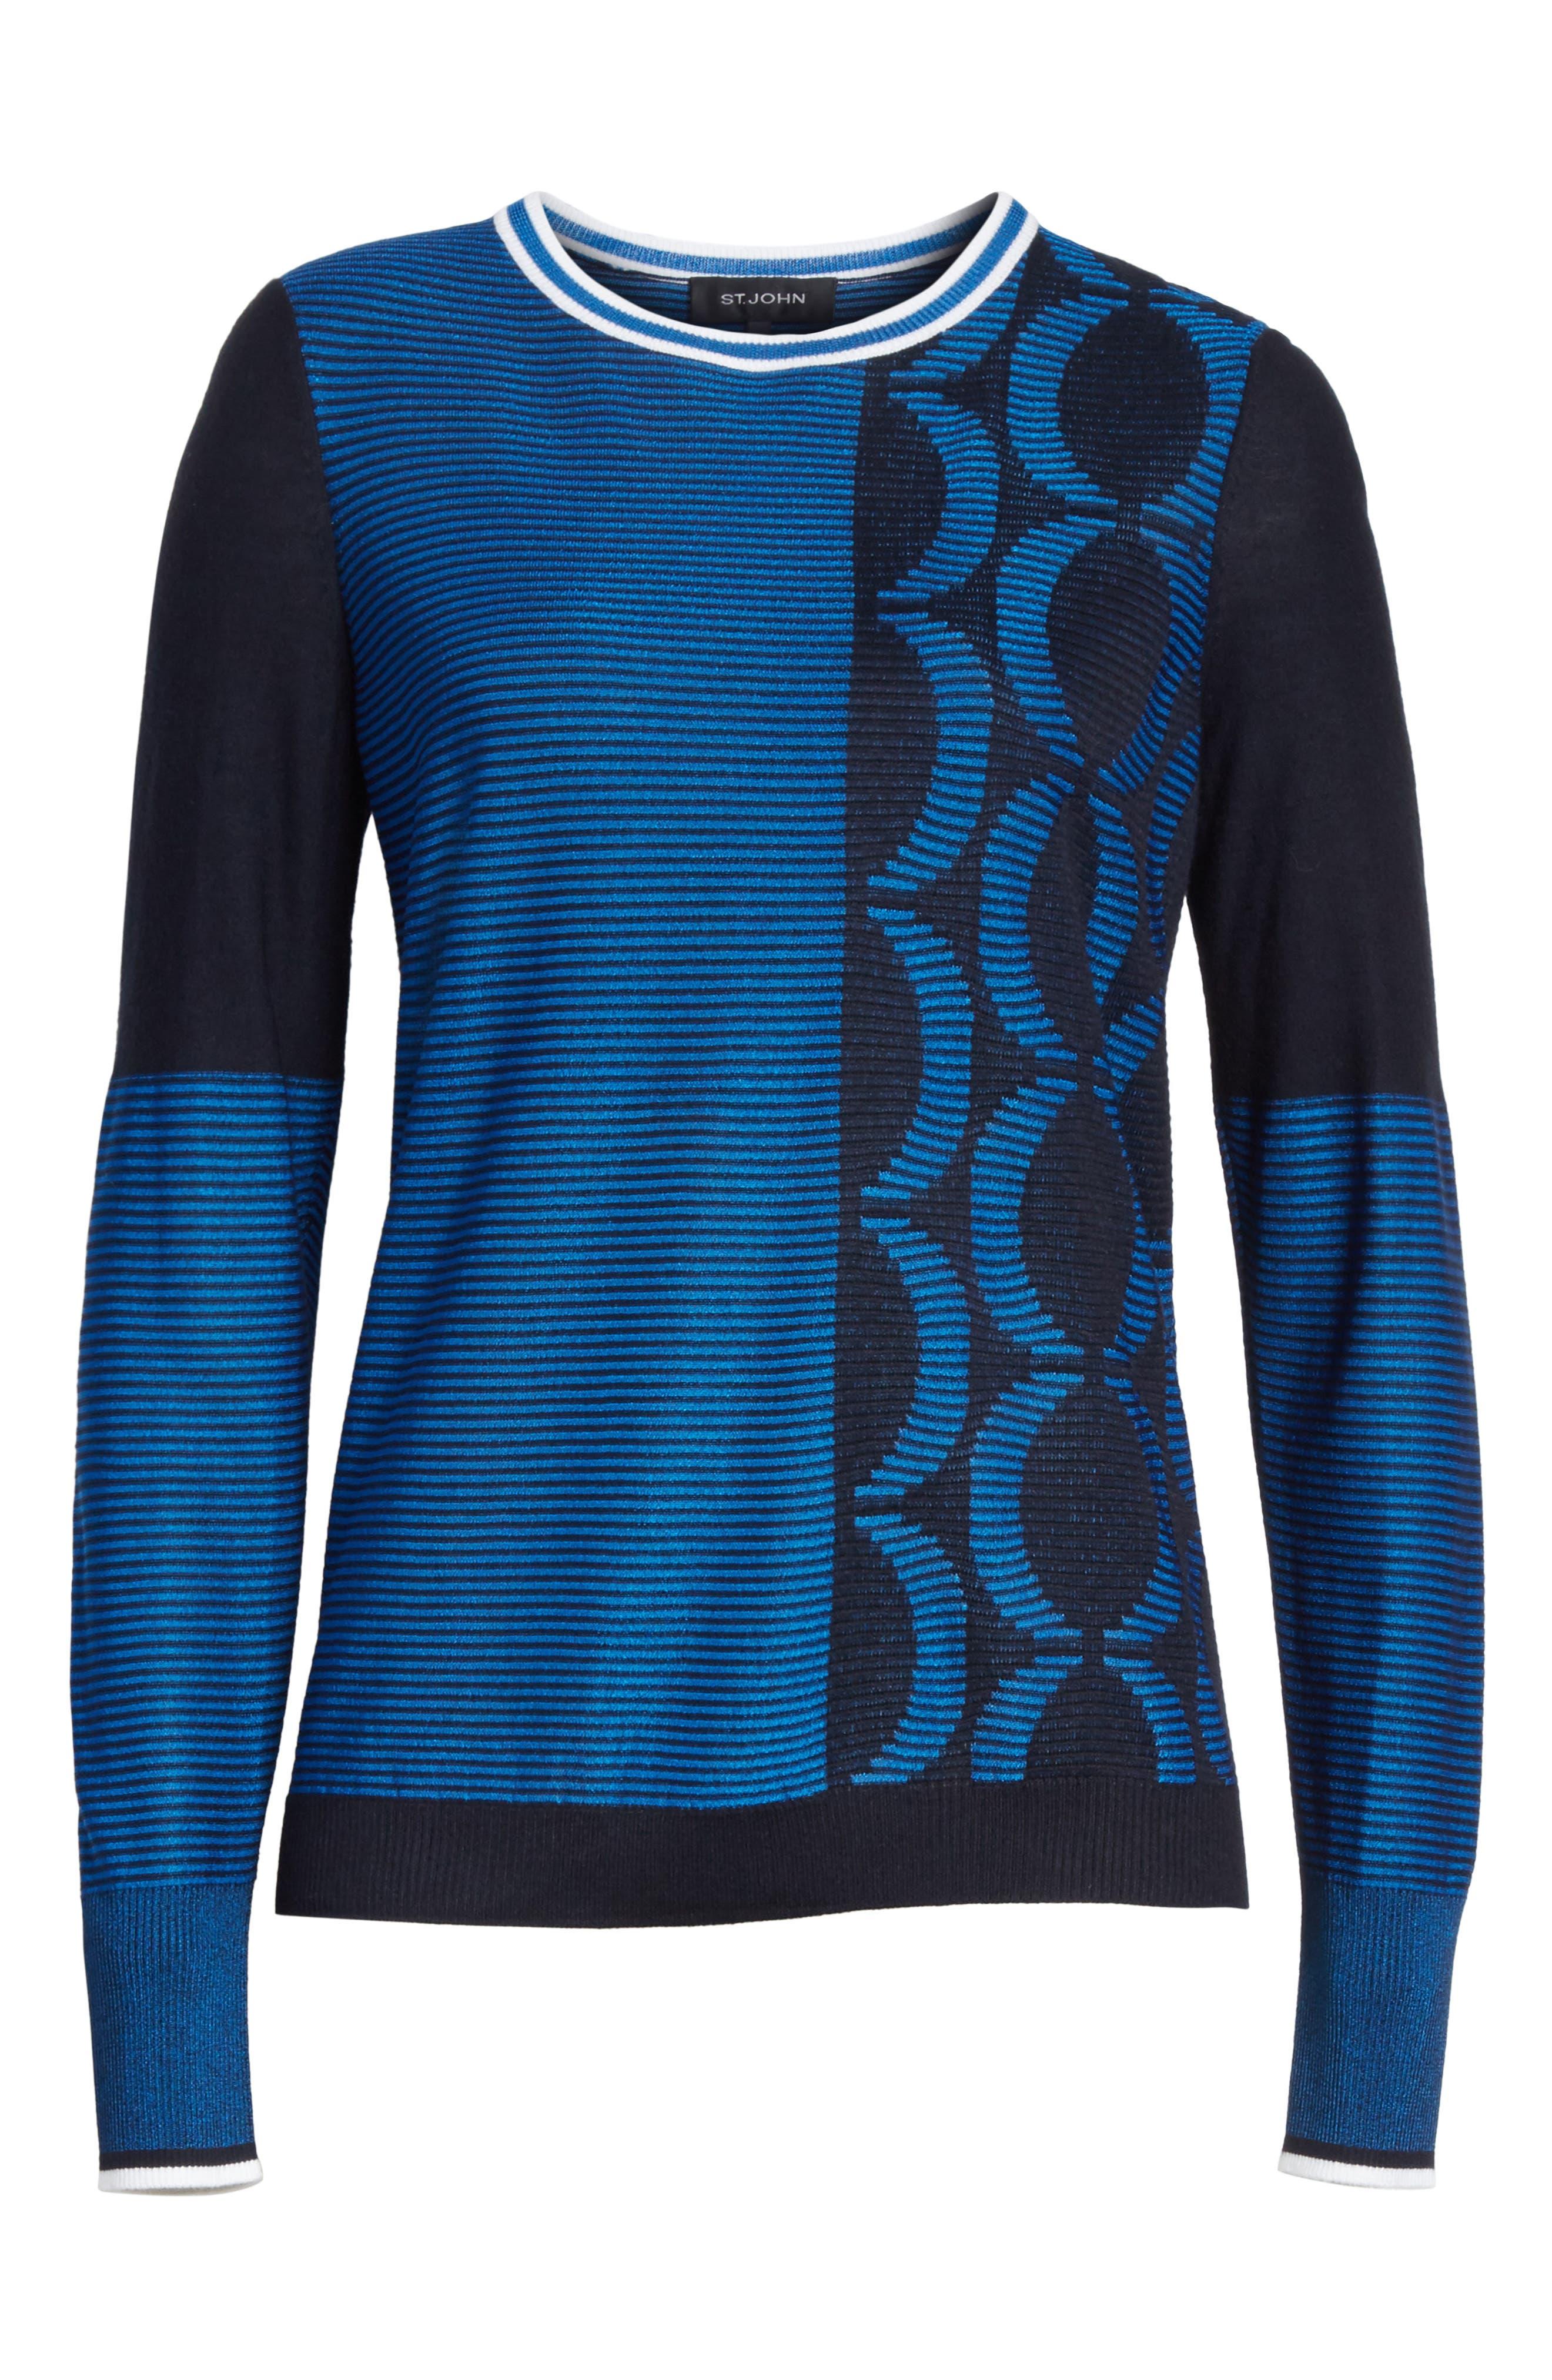 Jacquard Knit Sweater,                             Alternate thumbnail 6, color,                             Navy/ Niagara/ Bianco